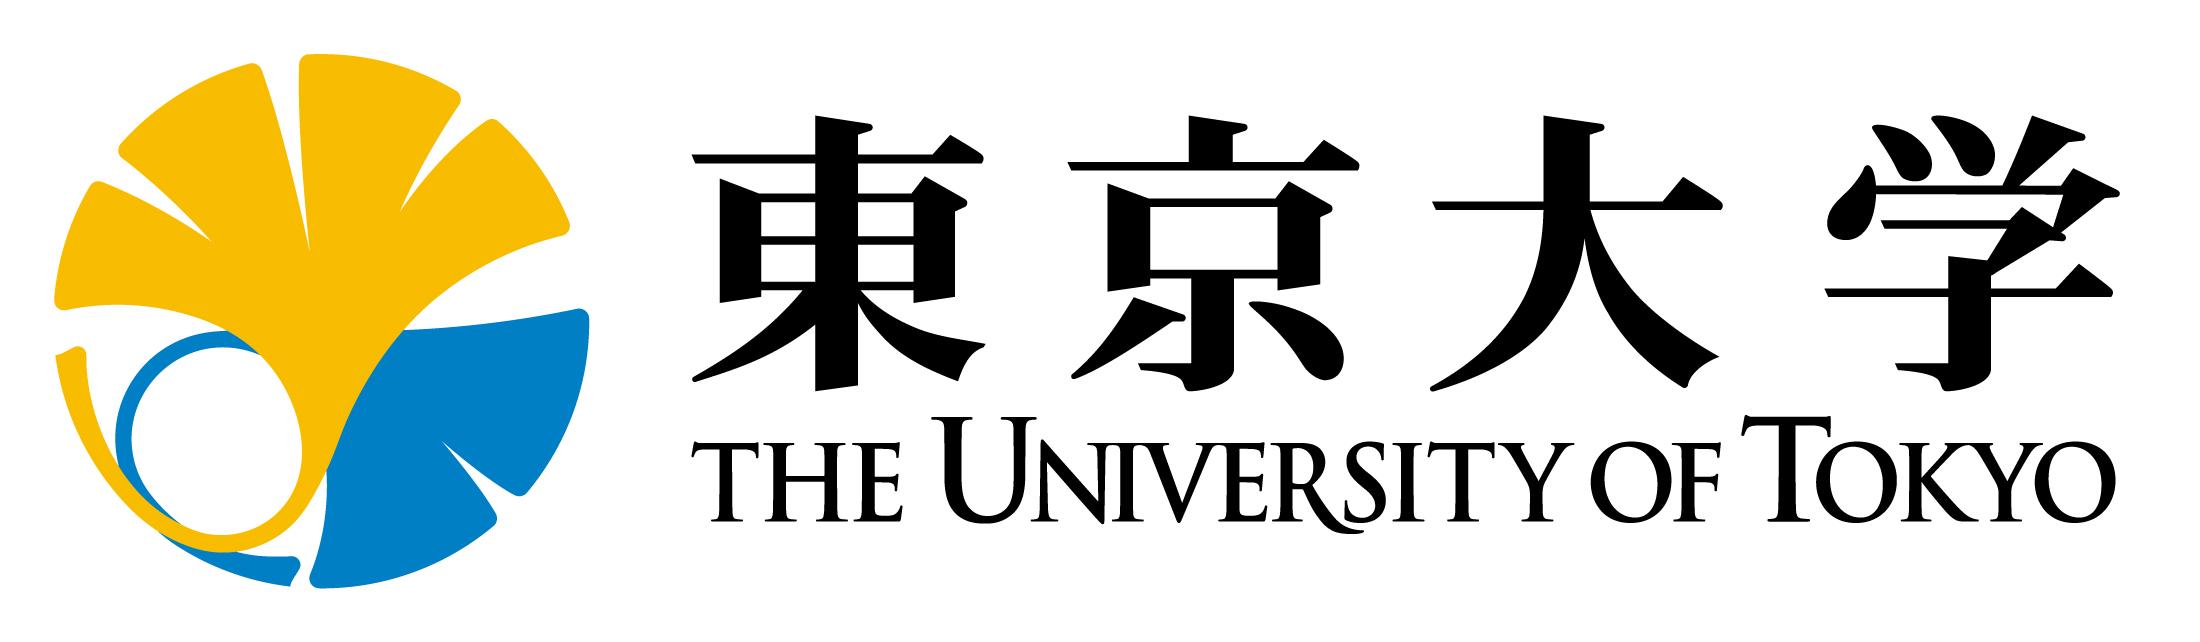 University of Tokyo, Japan